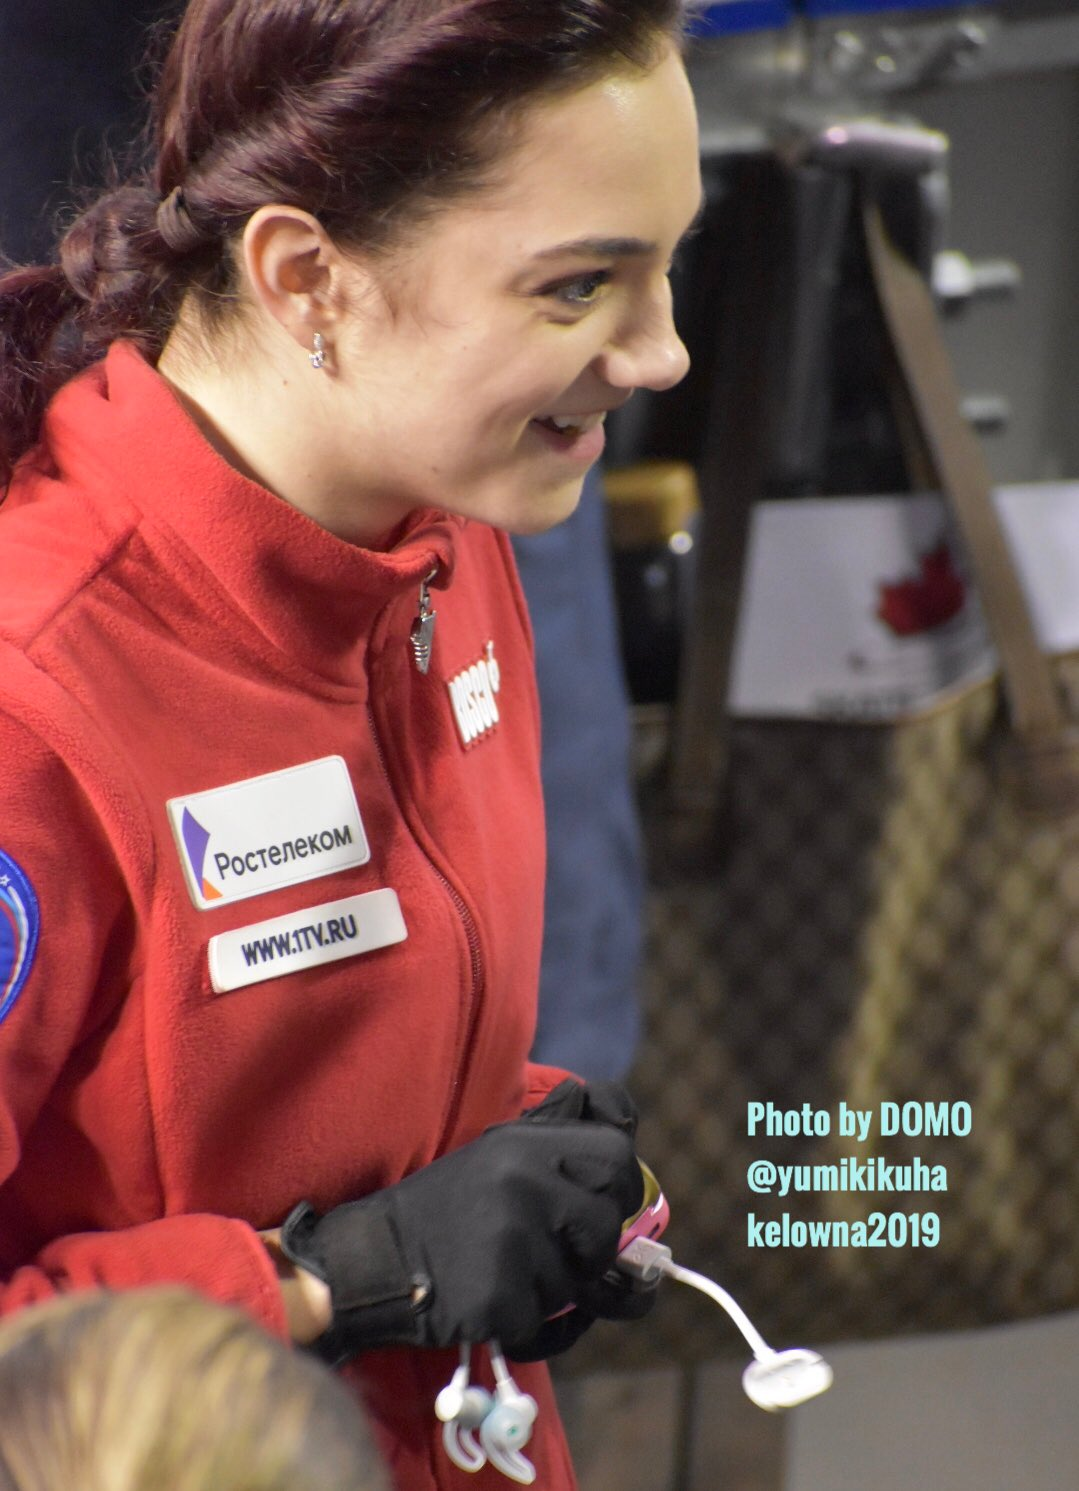 GP - 2 этап. Skate Canada International Kelowna, BC / CAN October 25-27, 2019 - Страница 4 EHq6FwDUwAcEQJ4?format=jpg&name=large